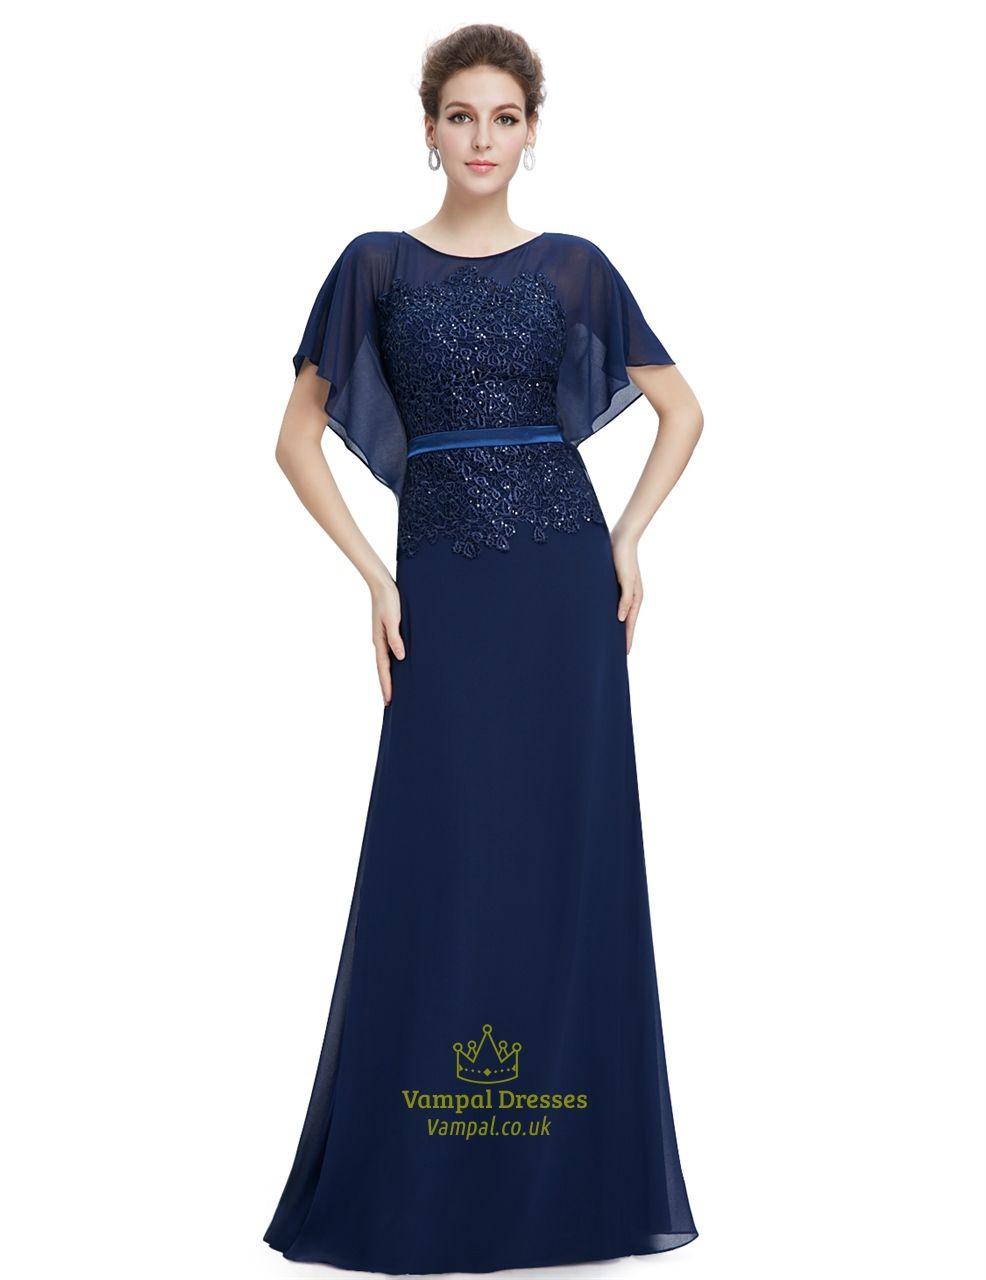 Navy blue chiffon flutter sheer sleeve prom dresses with lace navy blue chiffon flutter sheer sleeve prom dresses with lace applique ombrellifo Choice Image